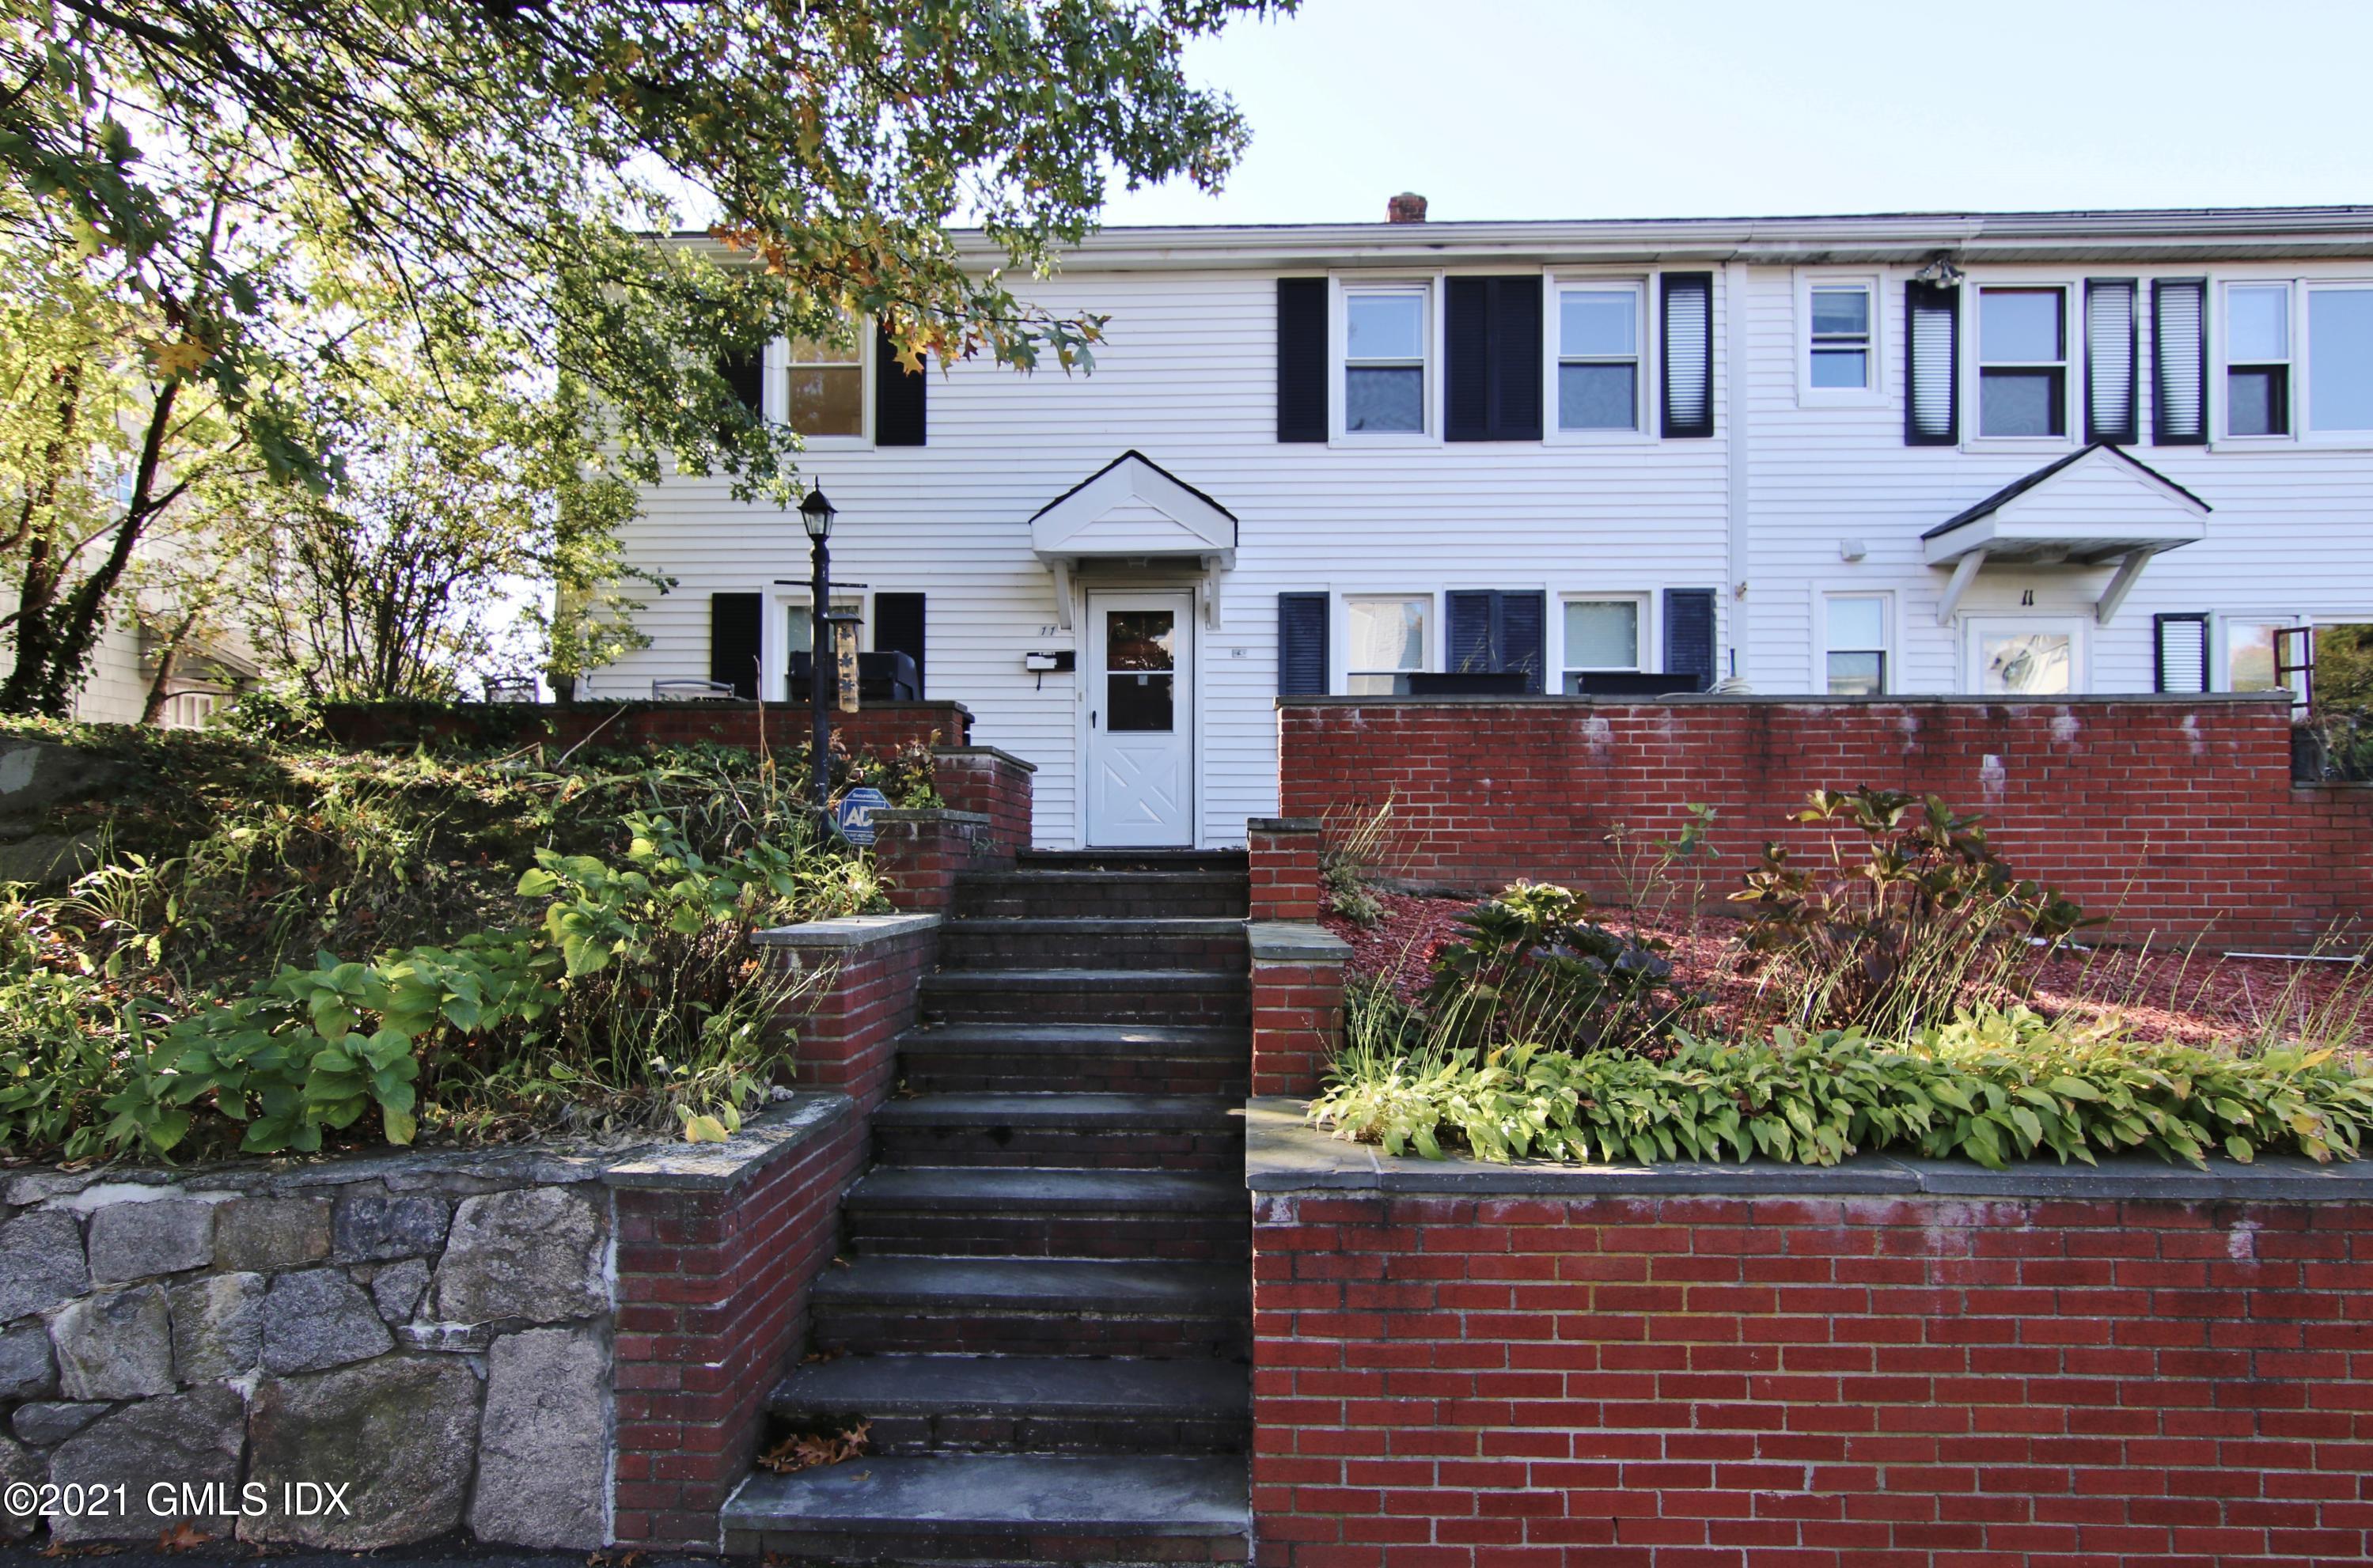 11 Gerry Street, Greenwich, Connecticut 06830, 3 Bedrooms Bedrooms, ,2 BathroomsBathrooms,Apartment,For Rent,Gerry,112269